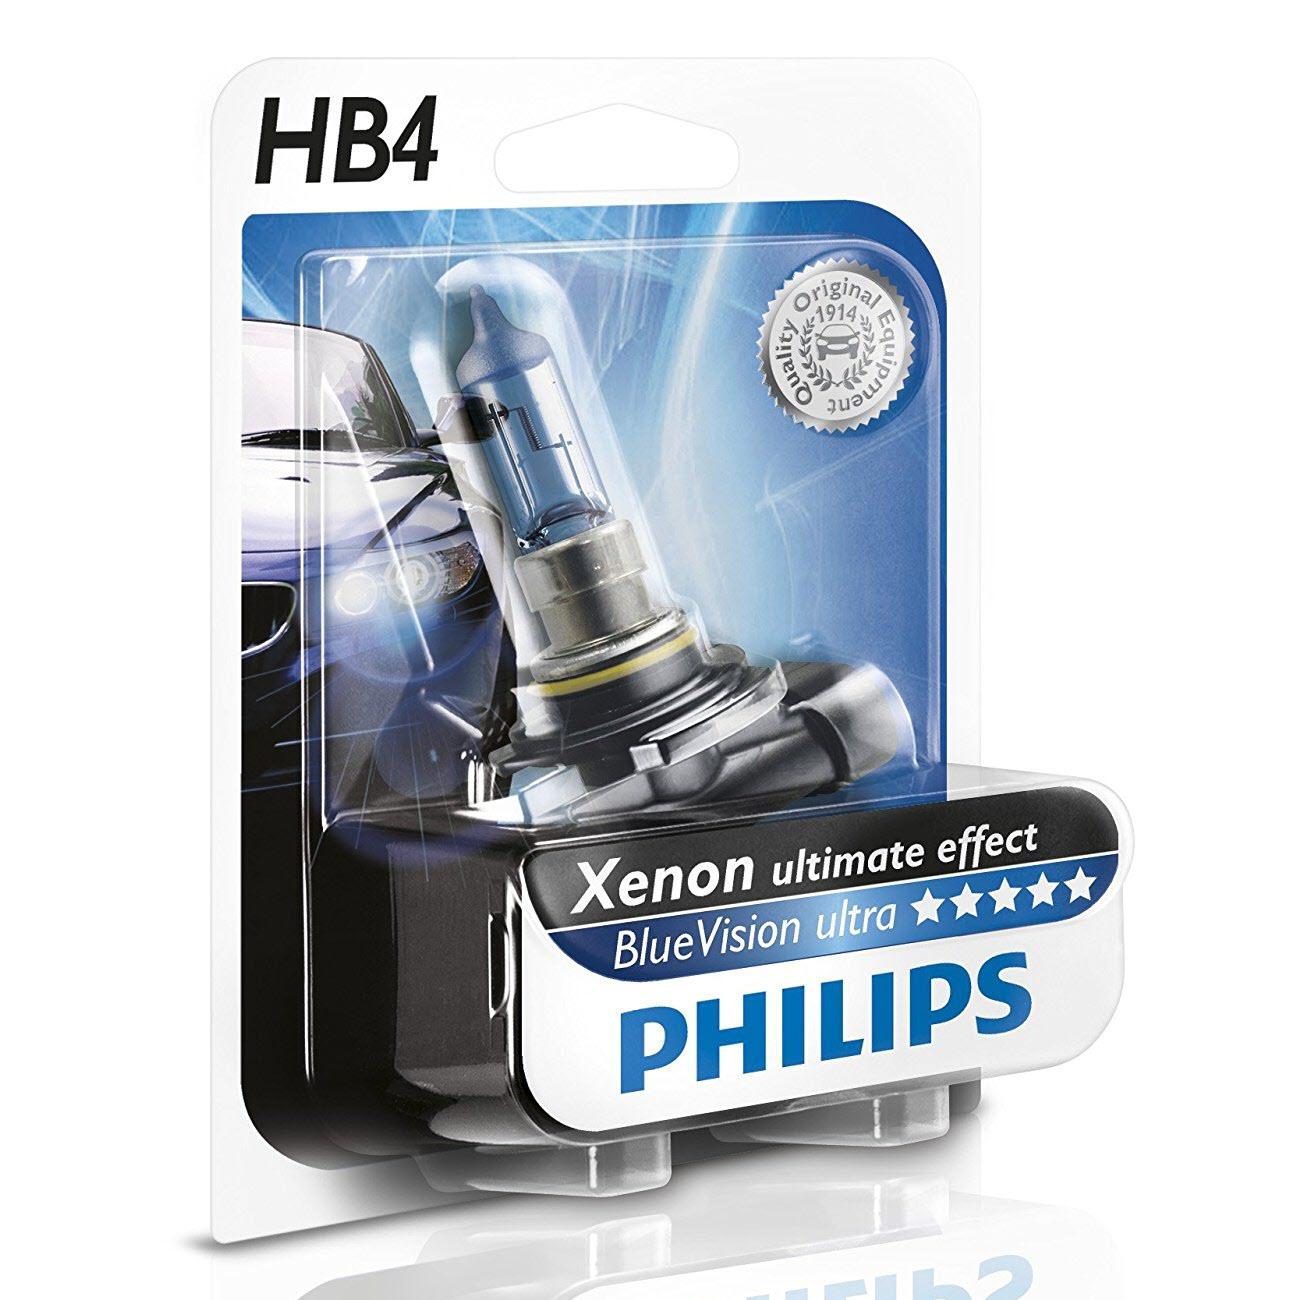 HB4 Philips Blue Vision Ultra Xenon ultimate effect 4000K (Single Pack) ส่งฟรี